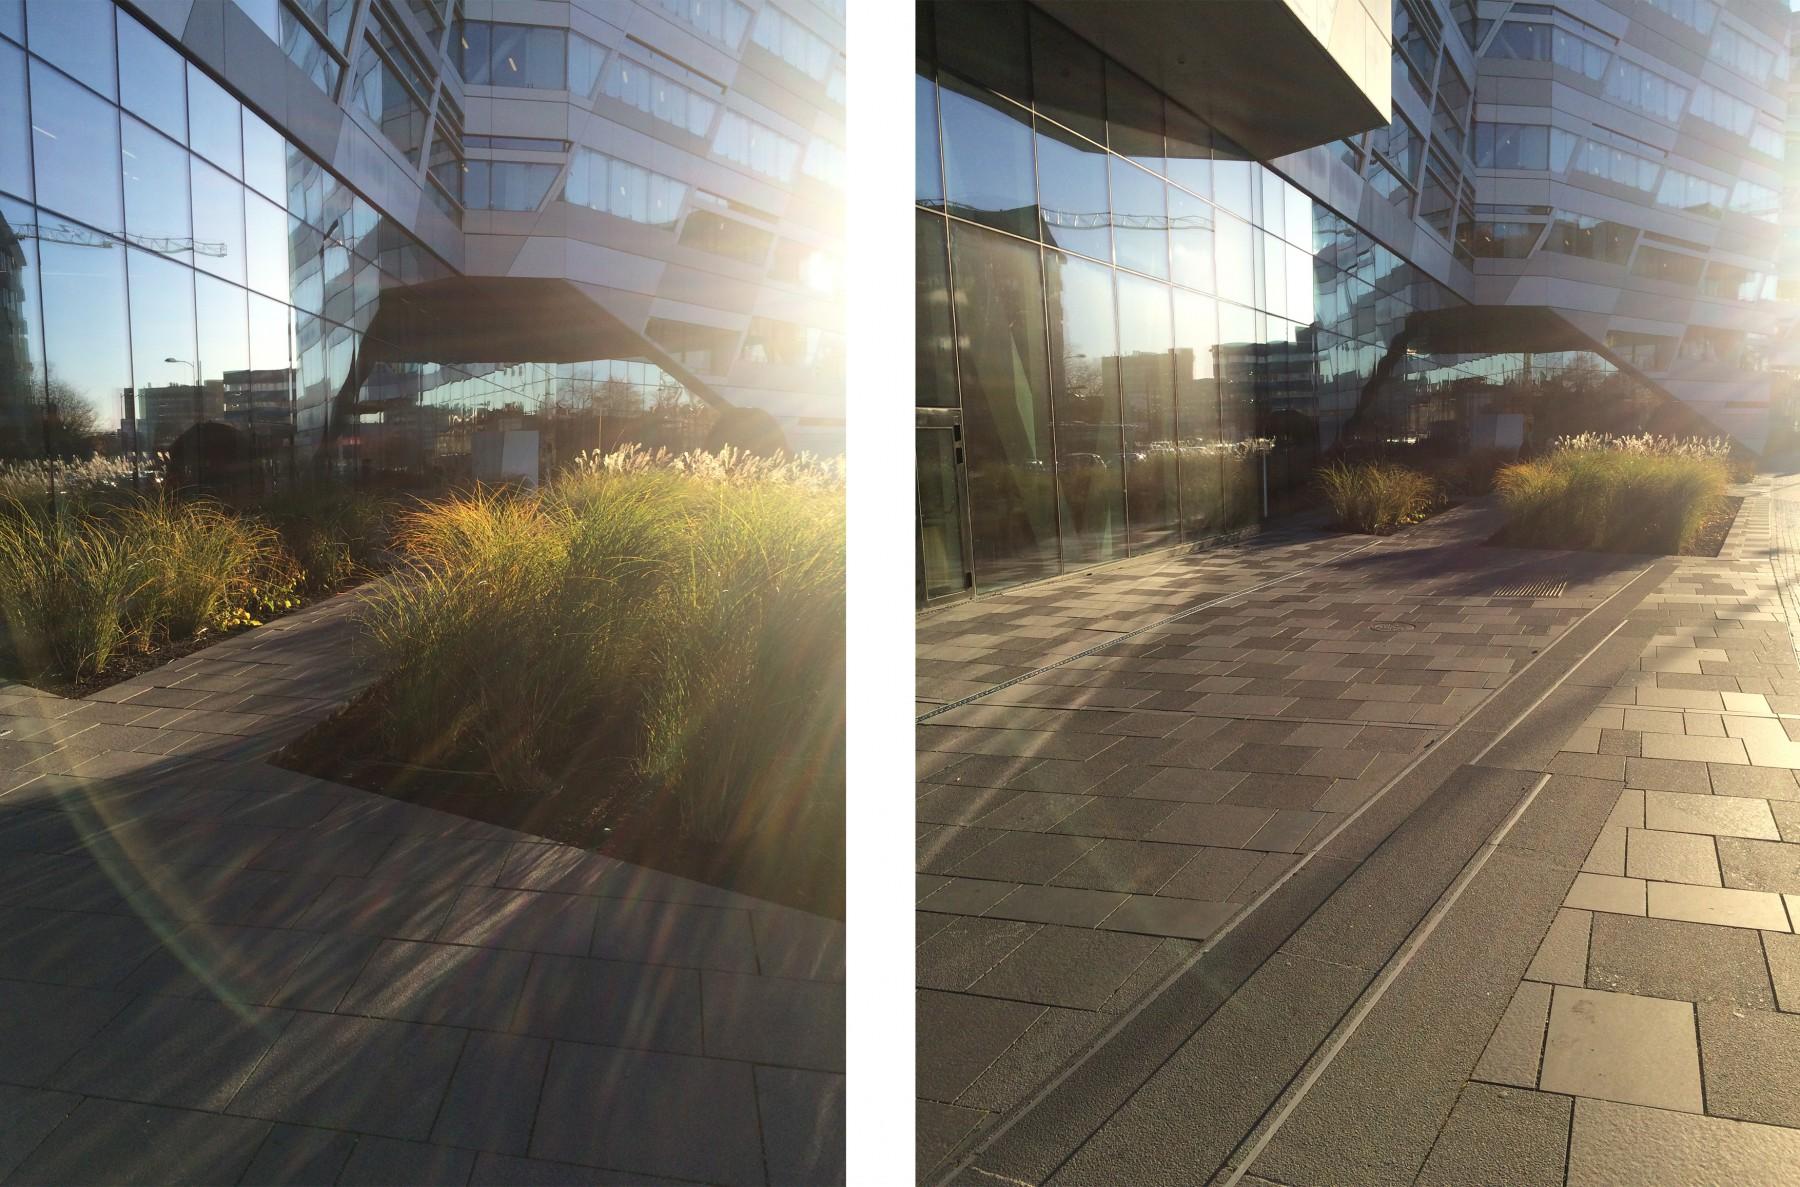 swedbank_LAND_2013_2014_11